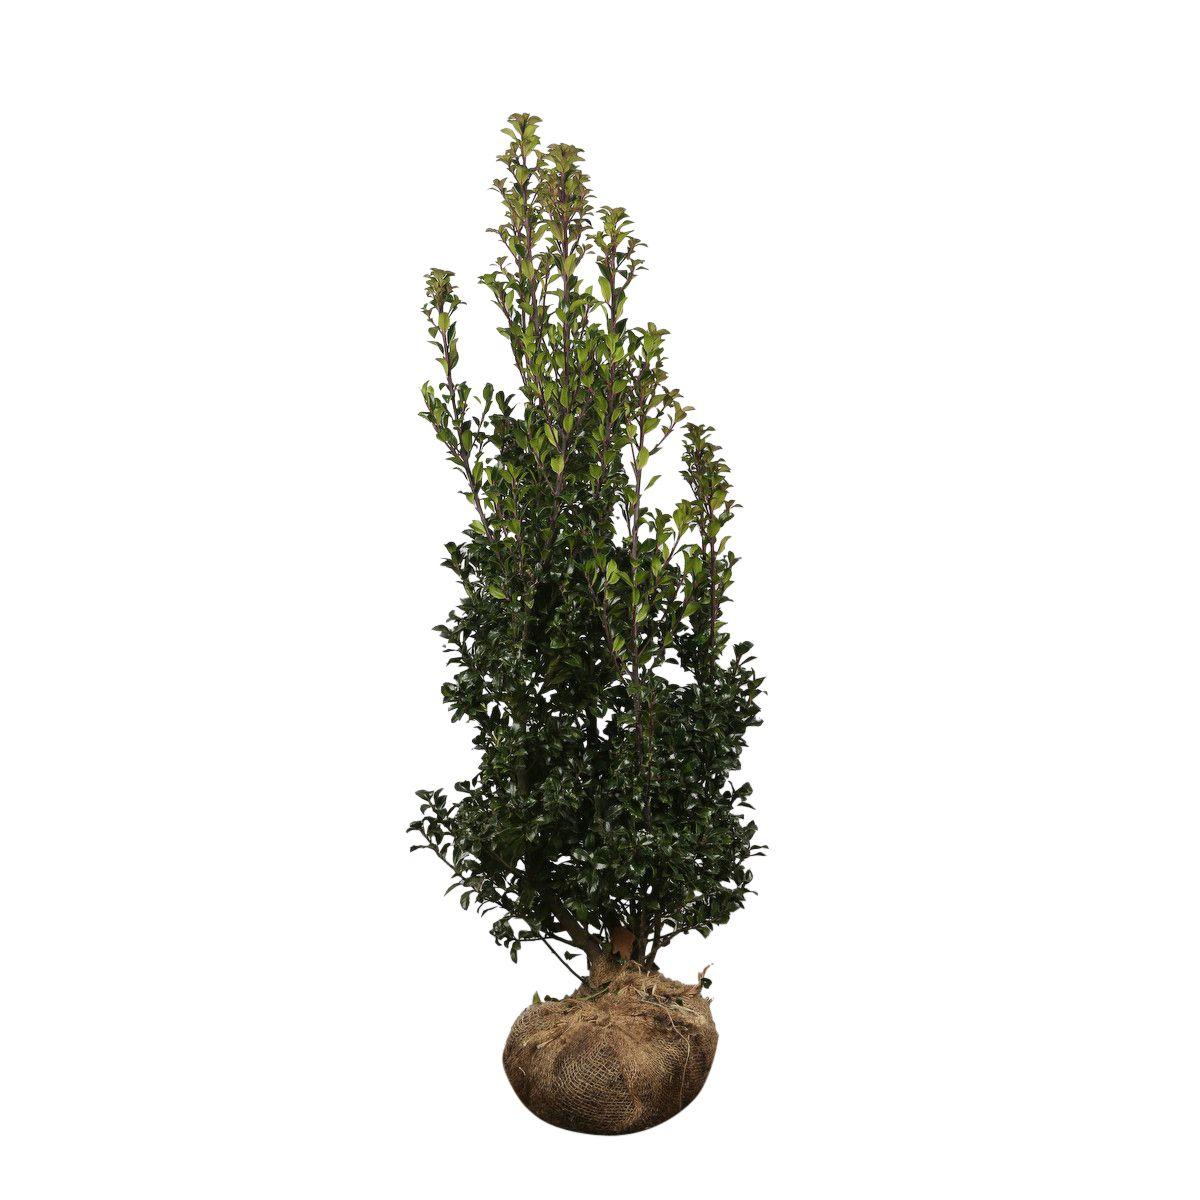 Hulst 'Heckenstar' Kluit 100-125 cm